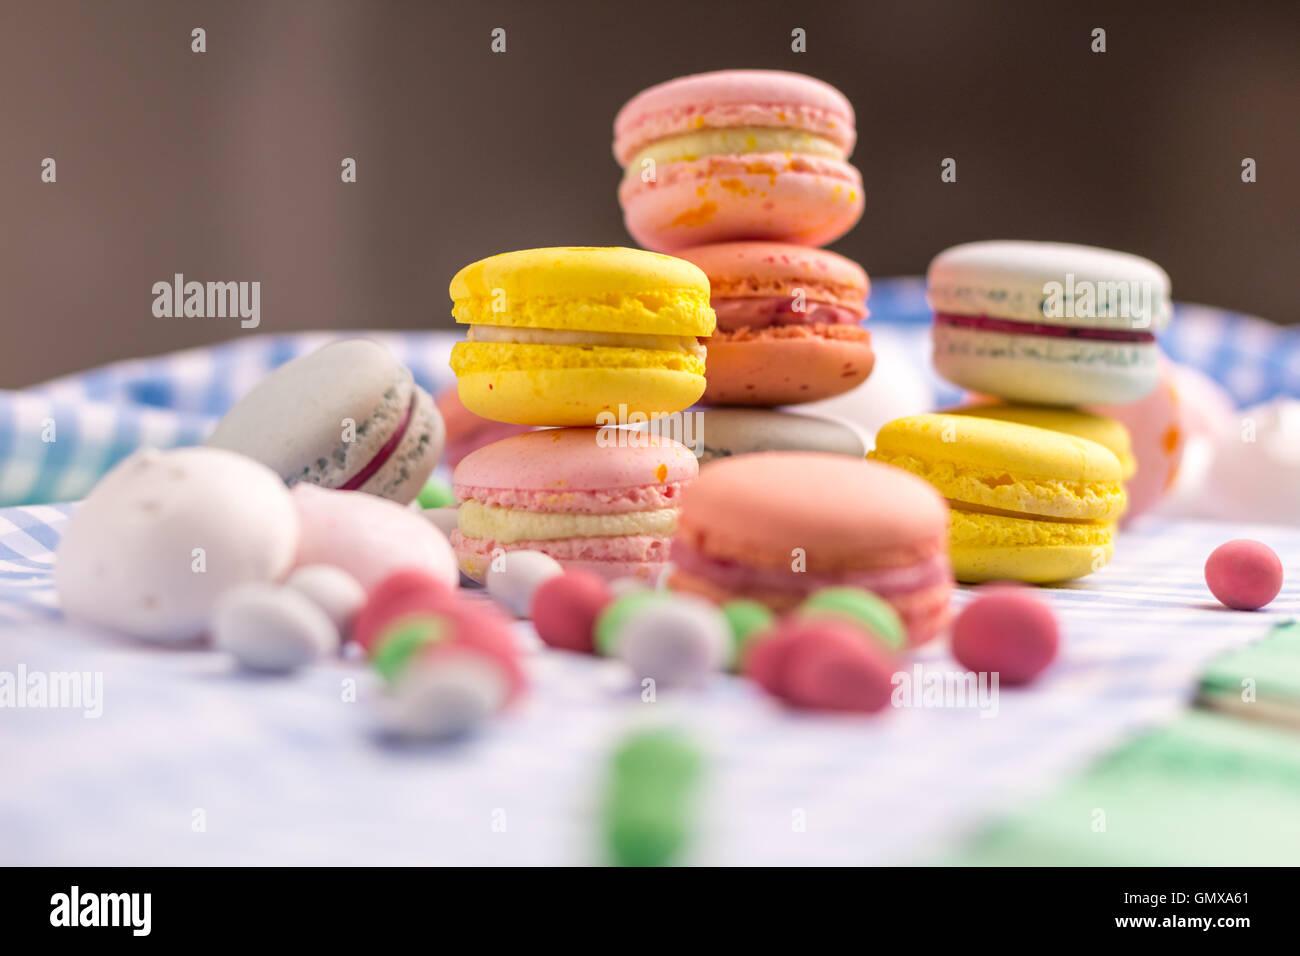 Confectionery Confit Stock Photos & Confectionery Confit